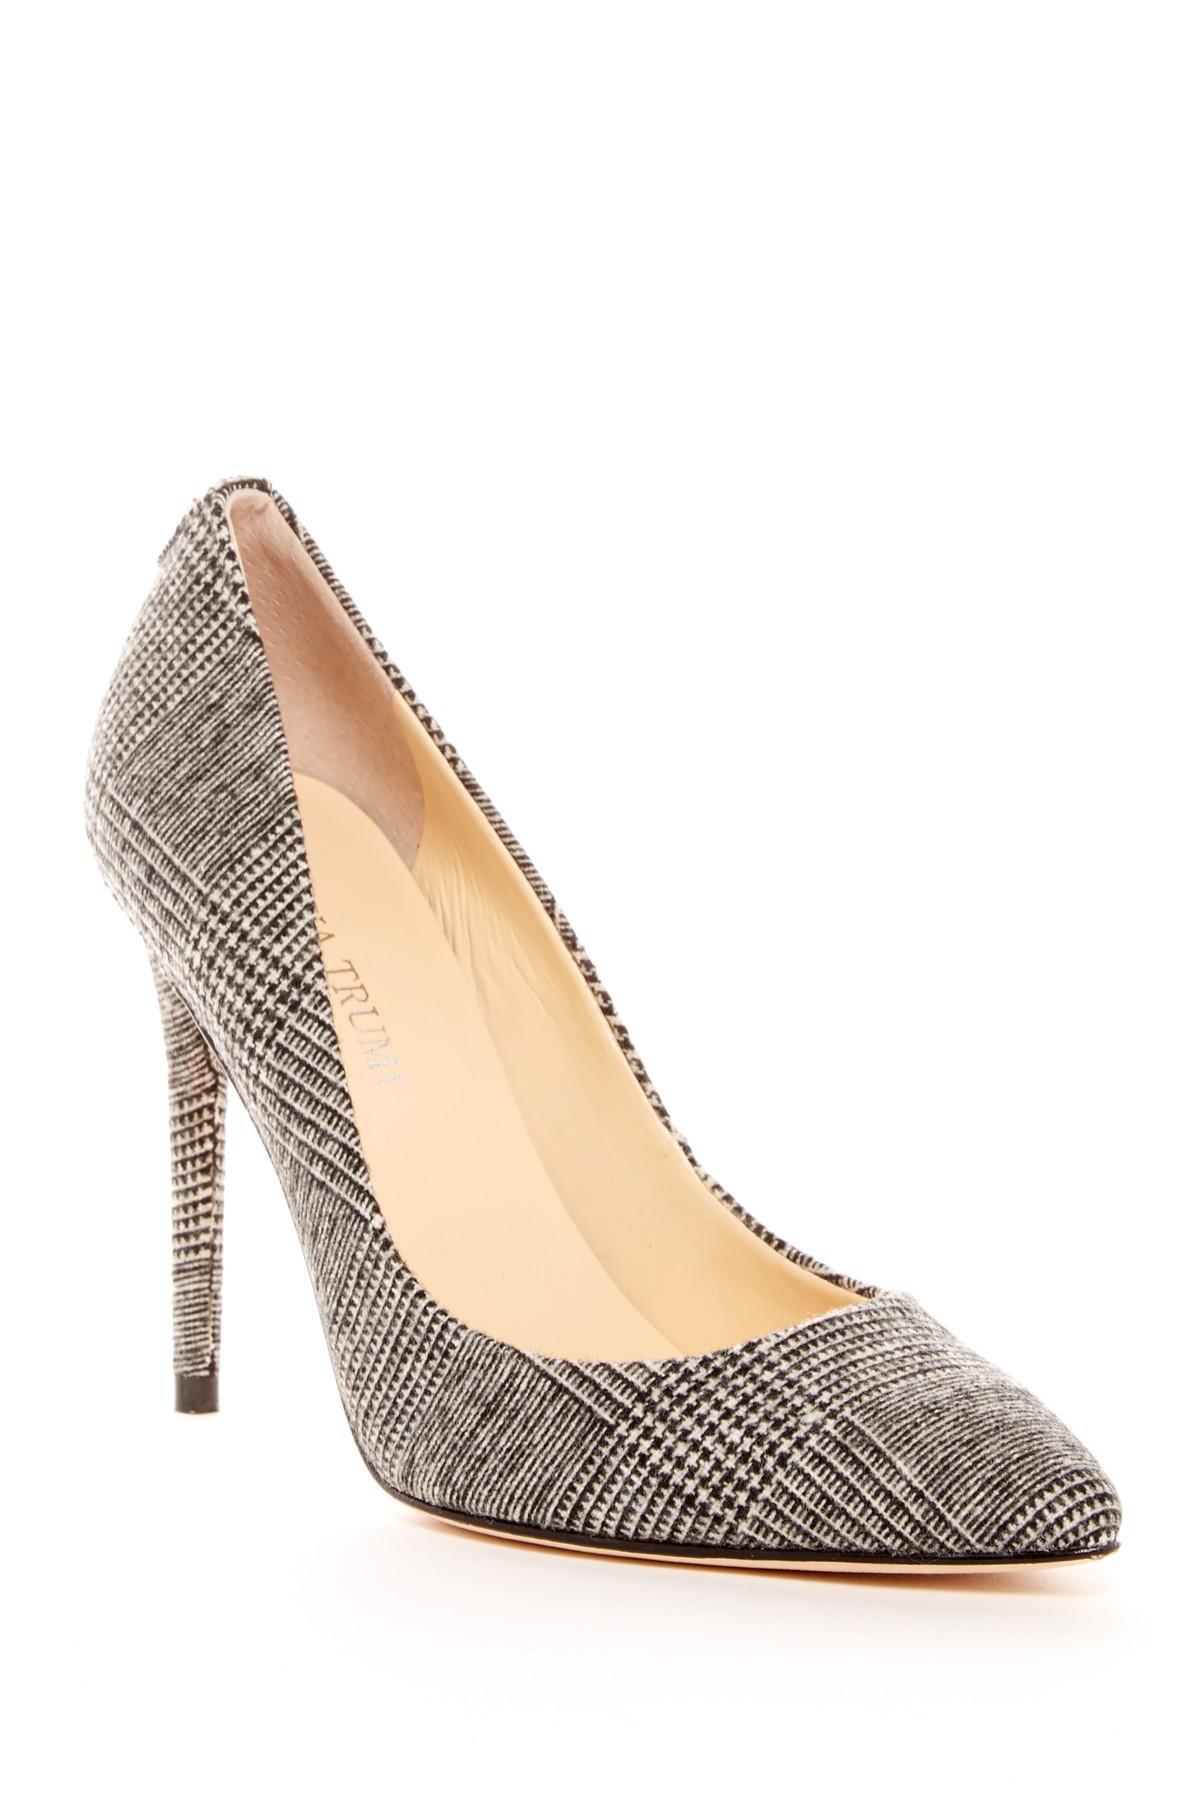 Ivanka trump Kayden Pu... Ivanka Trump Shoes Nordstrom Rack